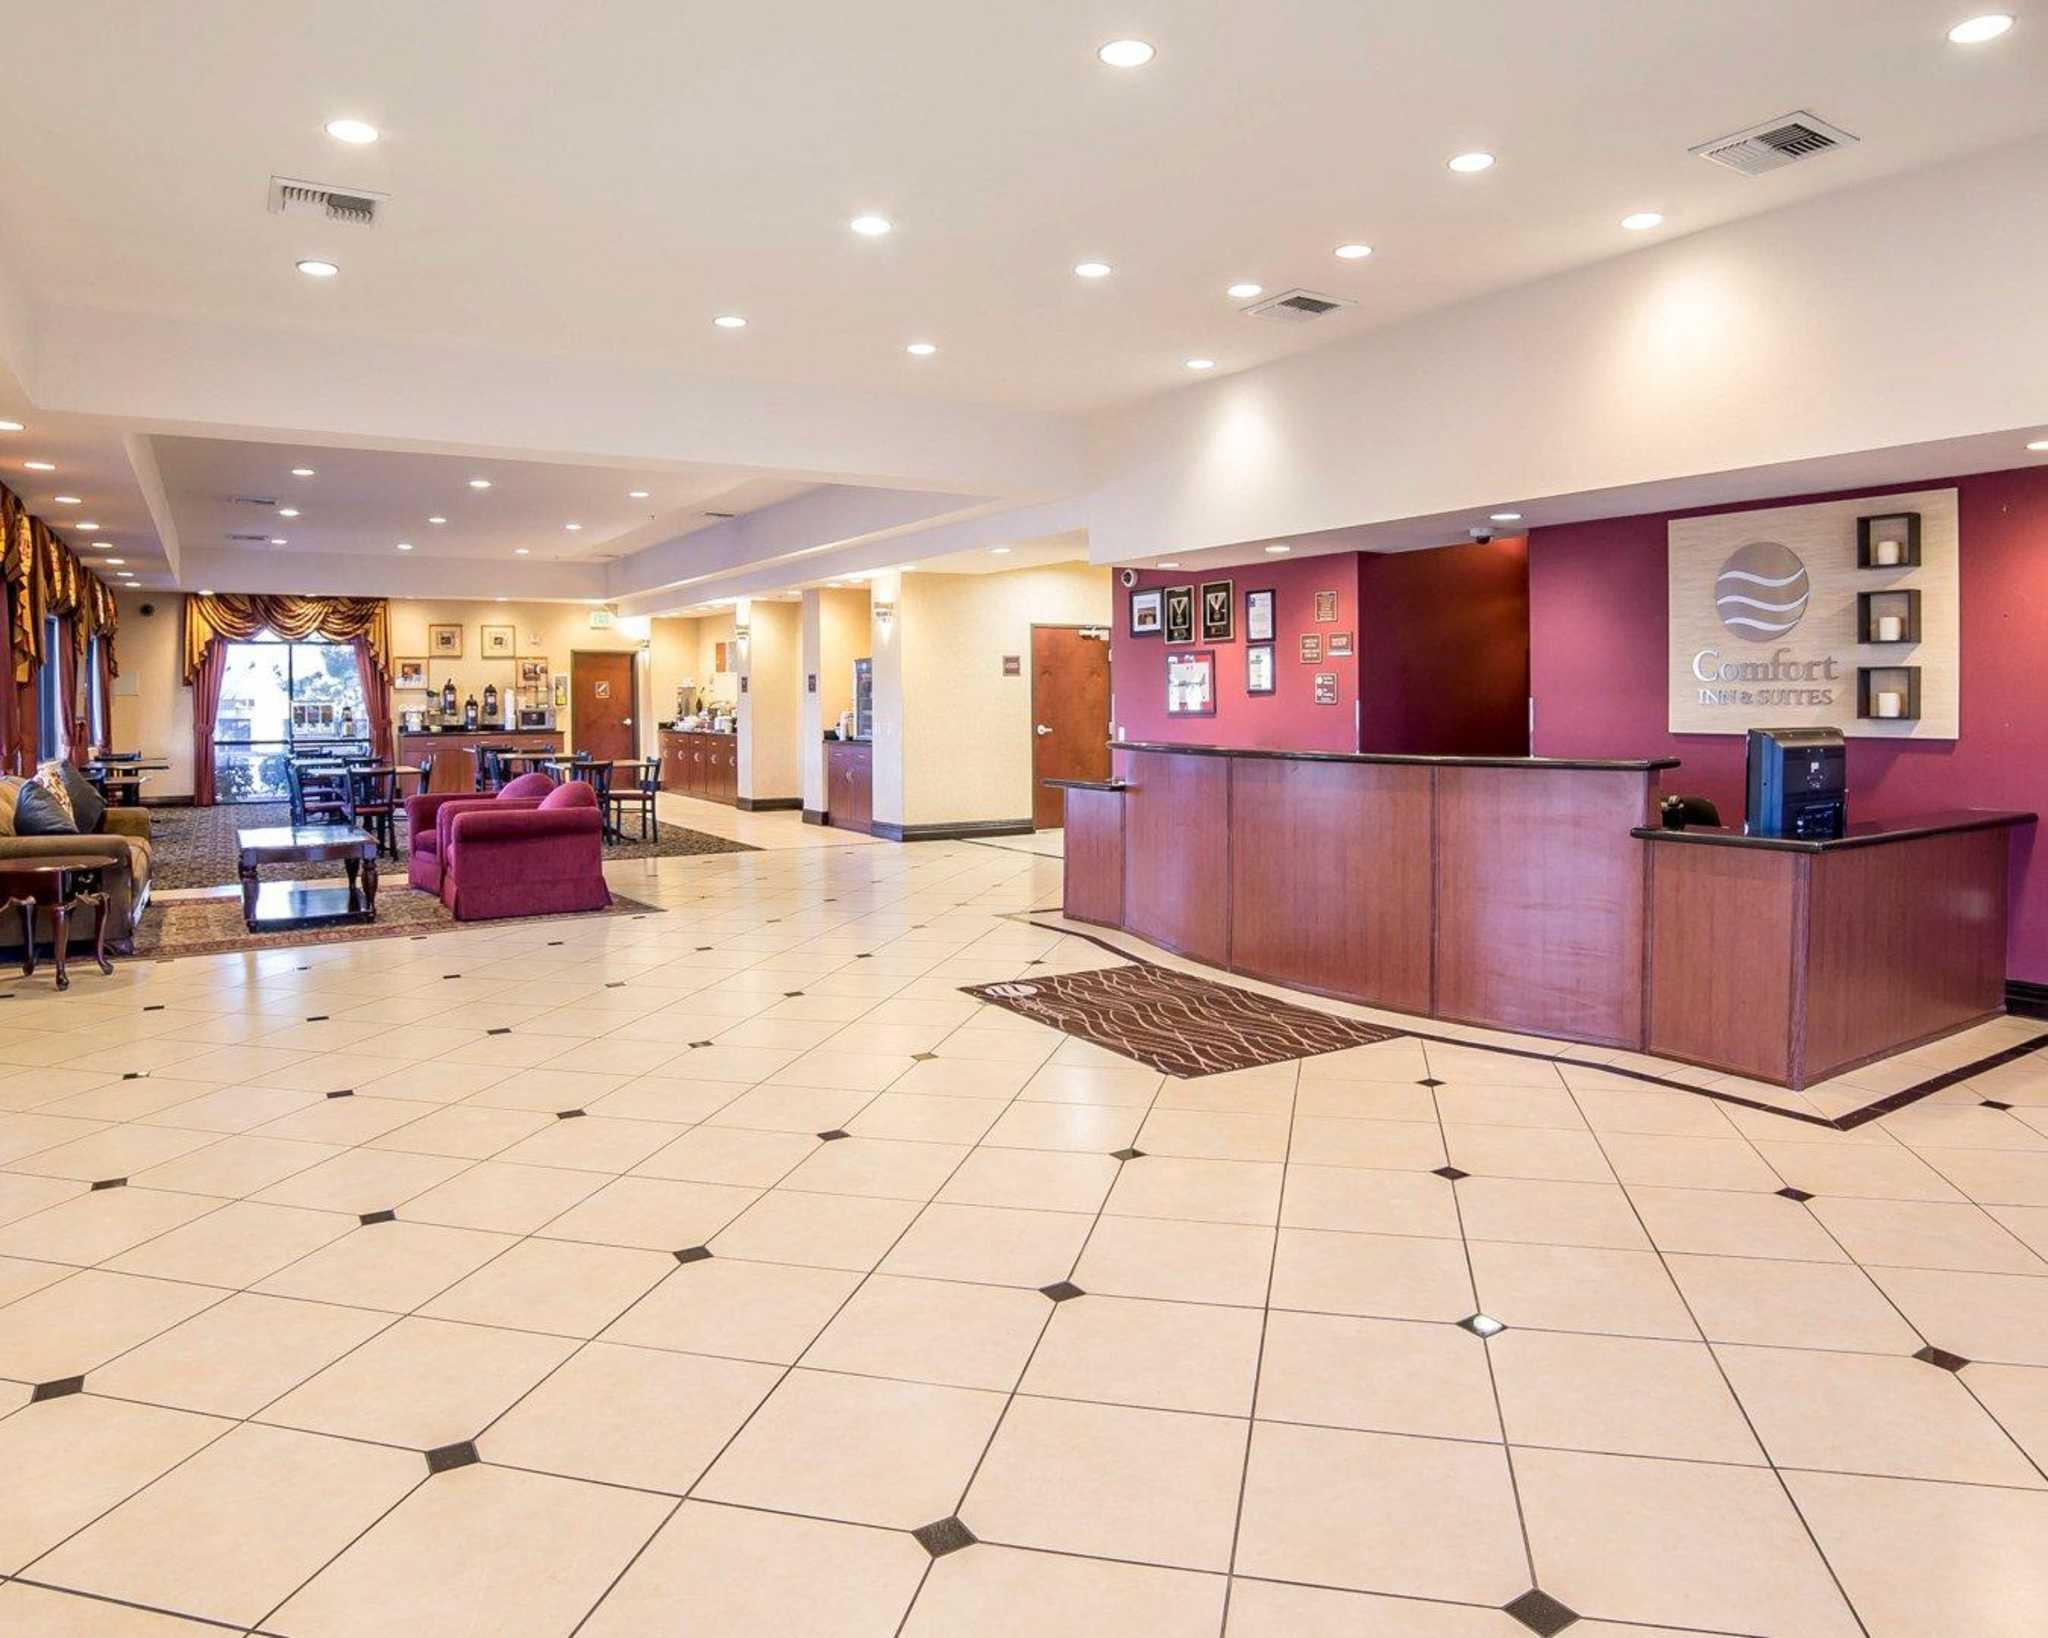 Comfort Inn & Suites Las Vegas - Nellis image 5